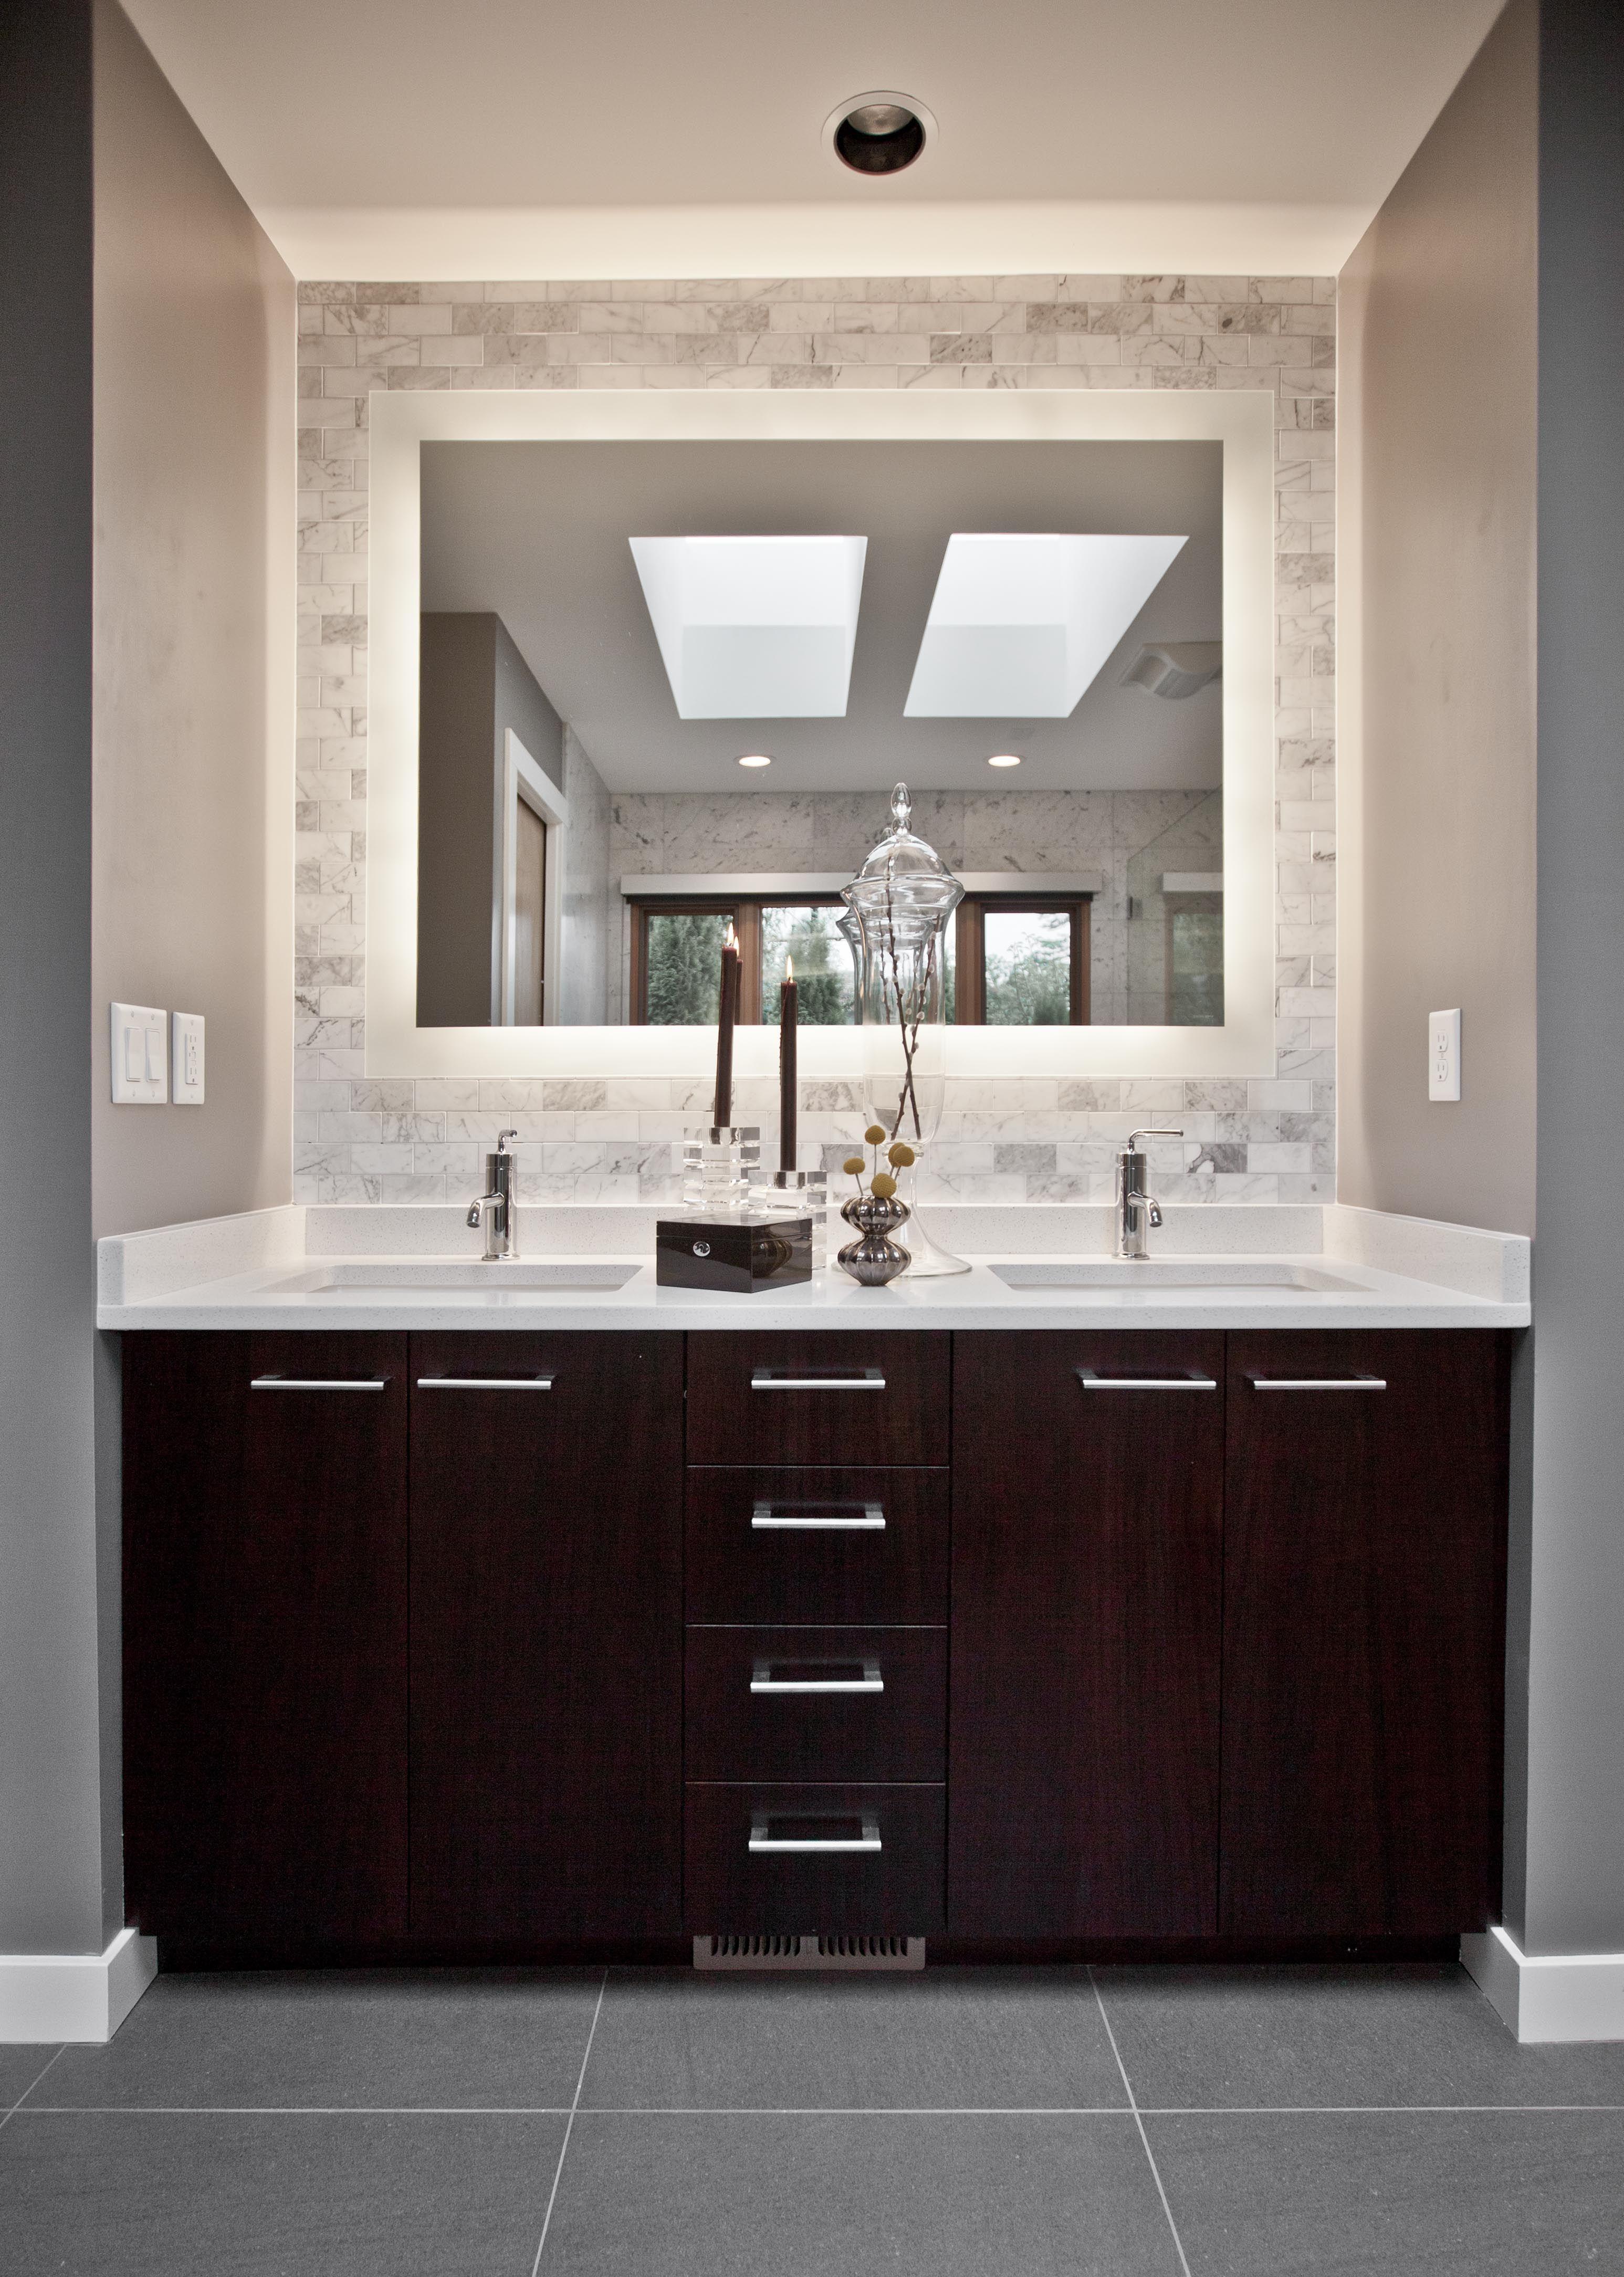 The 25+ best Backlit mirror ideas on Pinterest | Modern ...